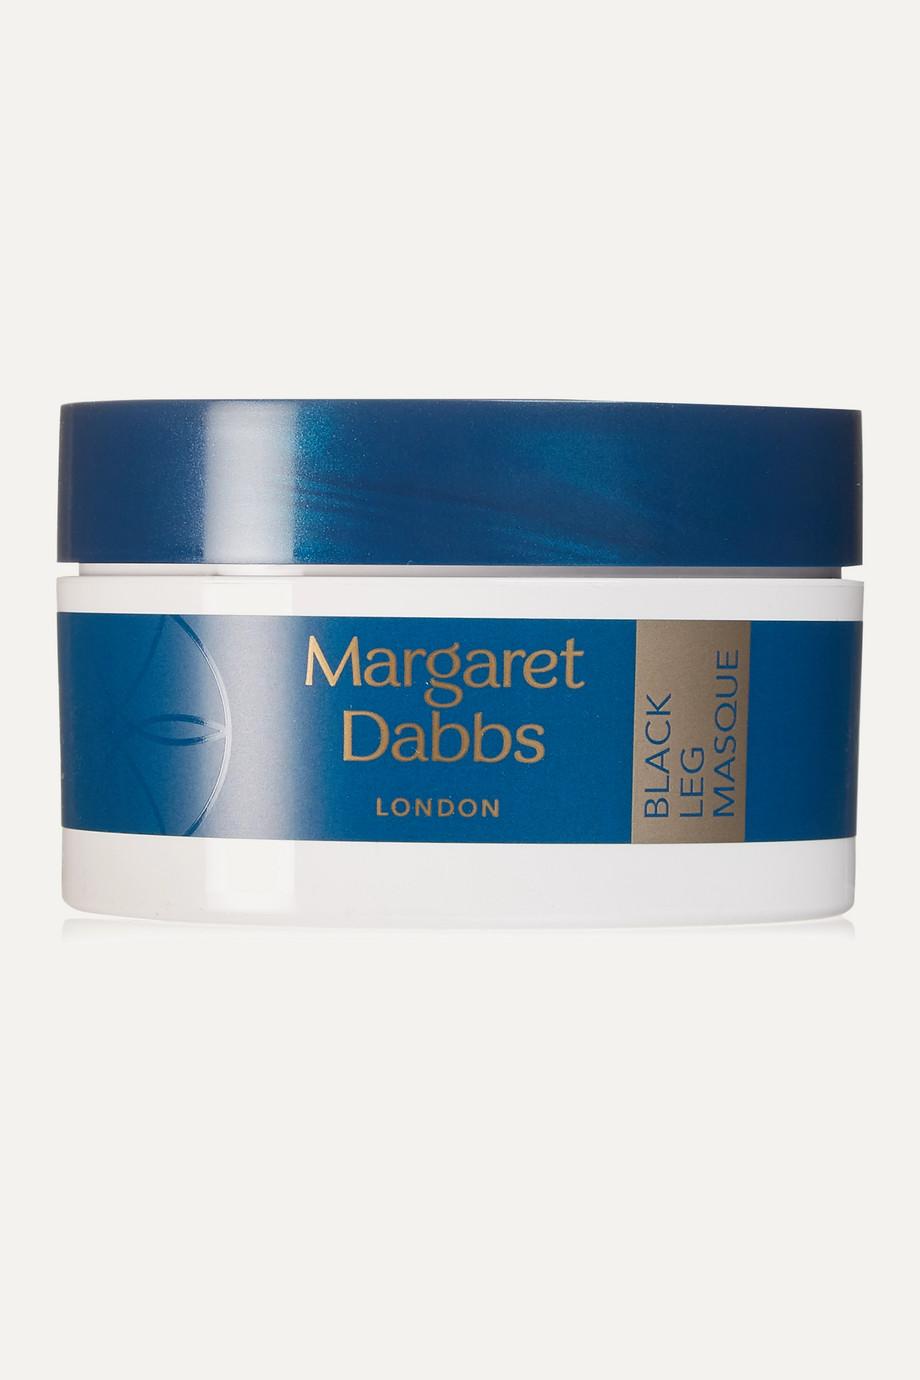 Margaret Dabbs London Black Leg Masque, 200g